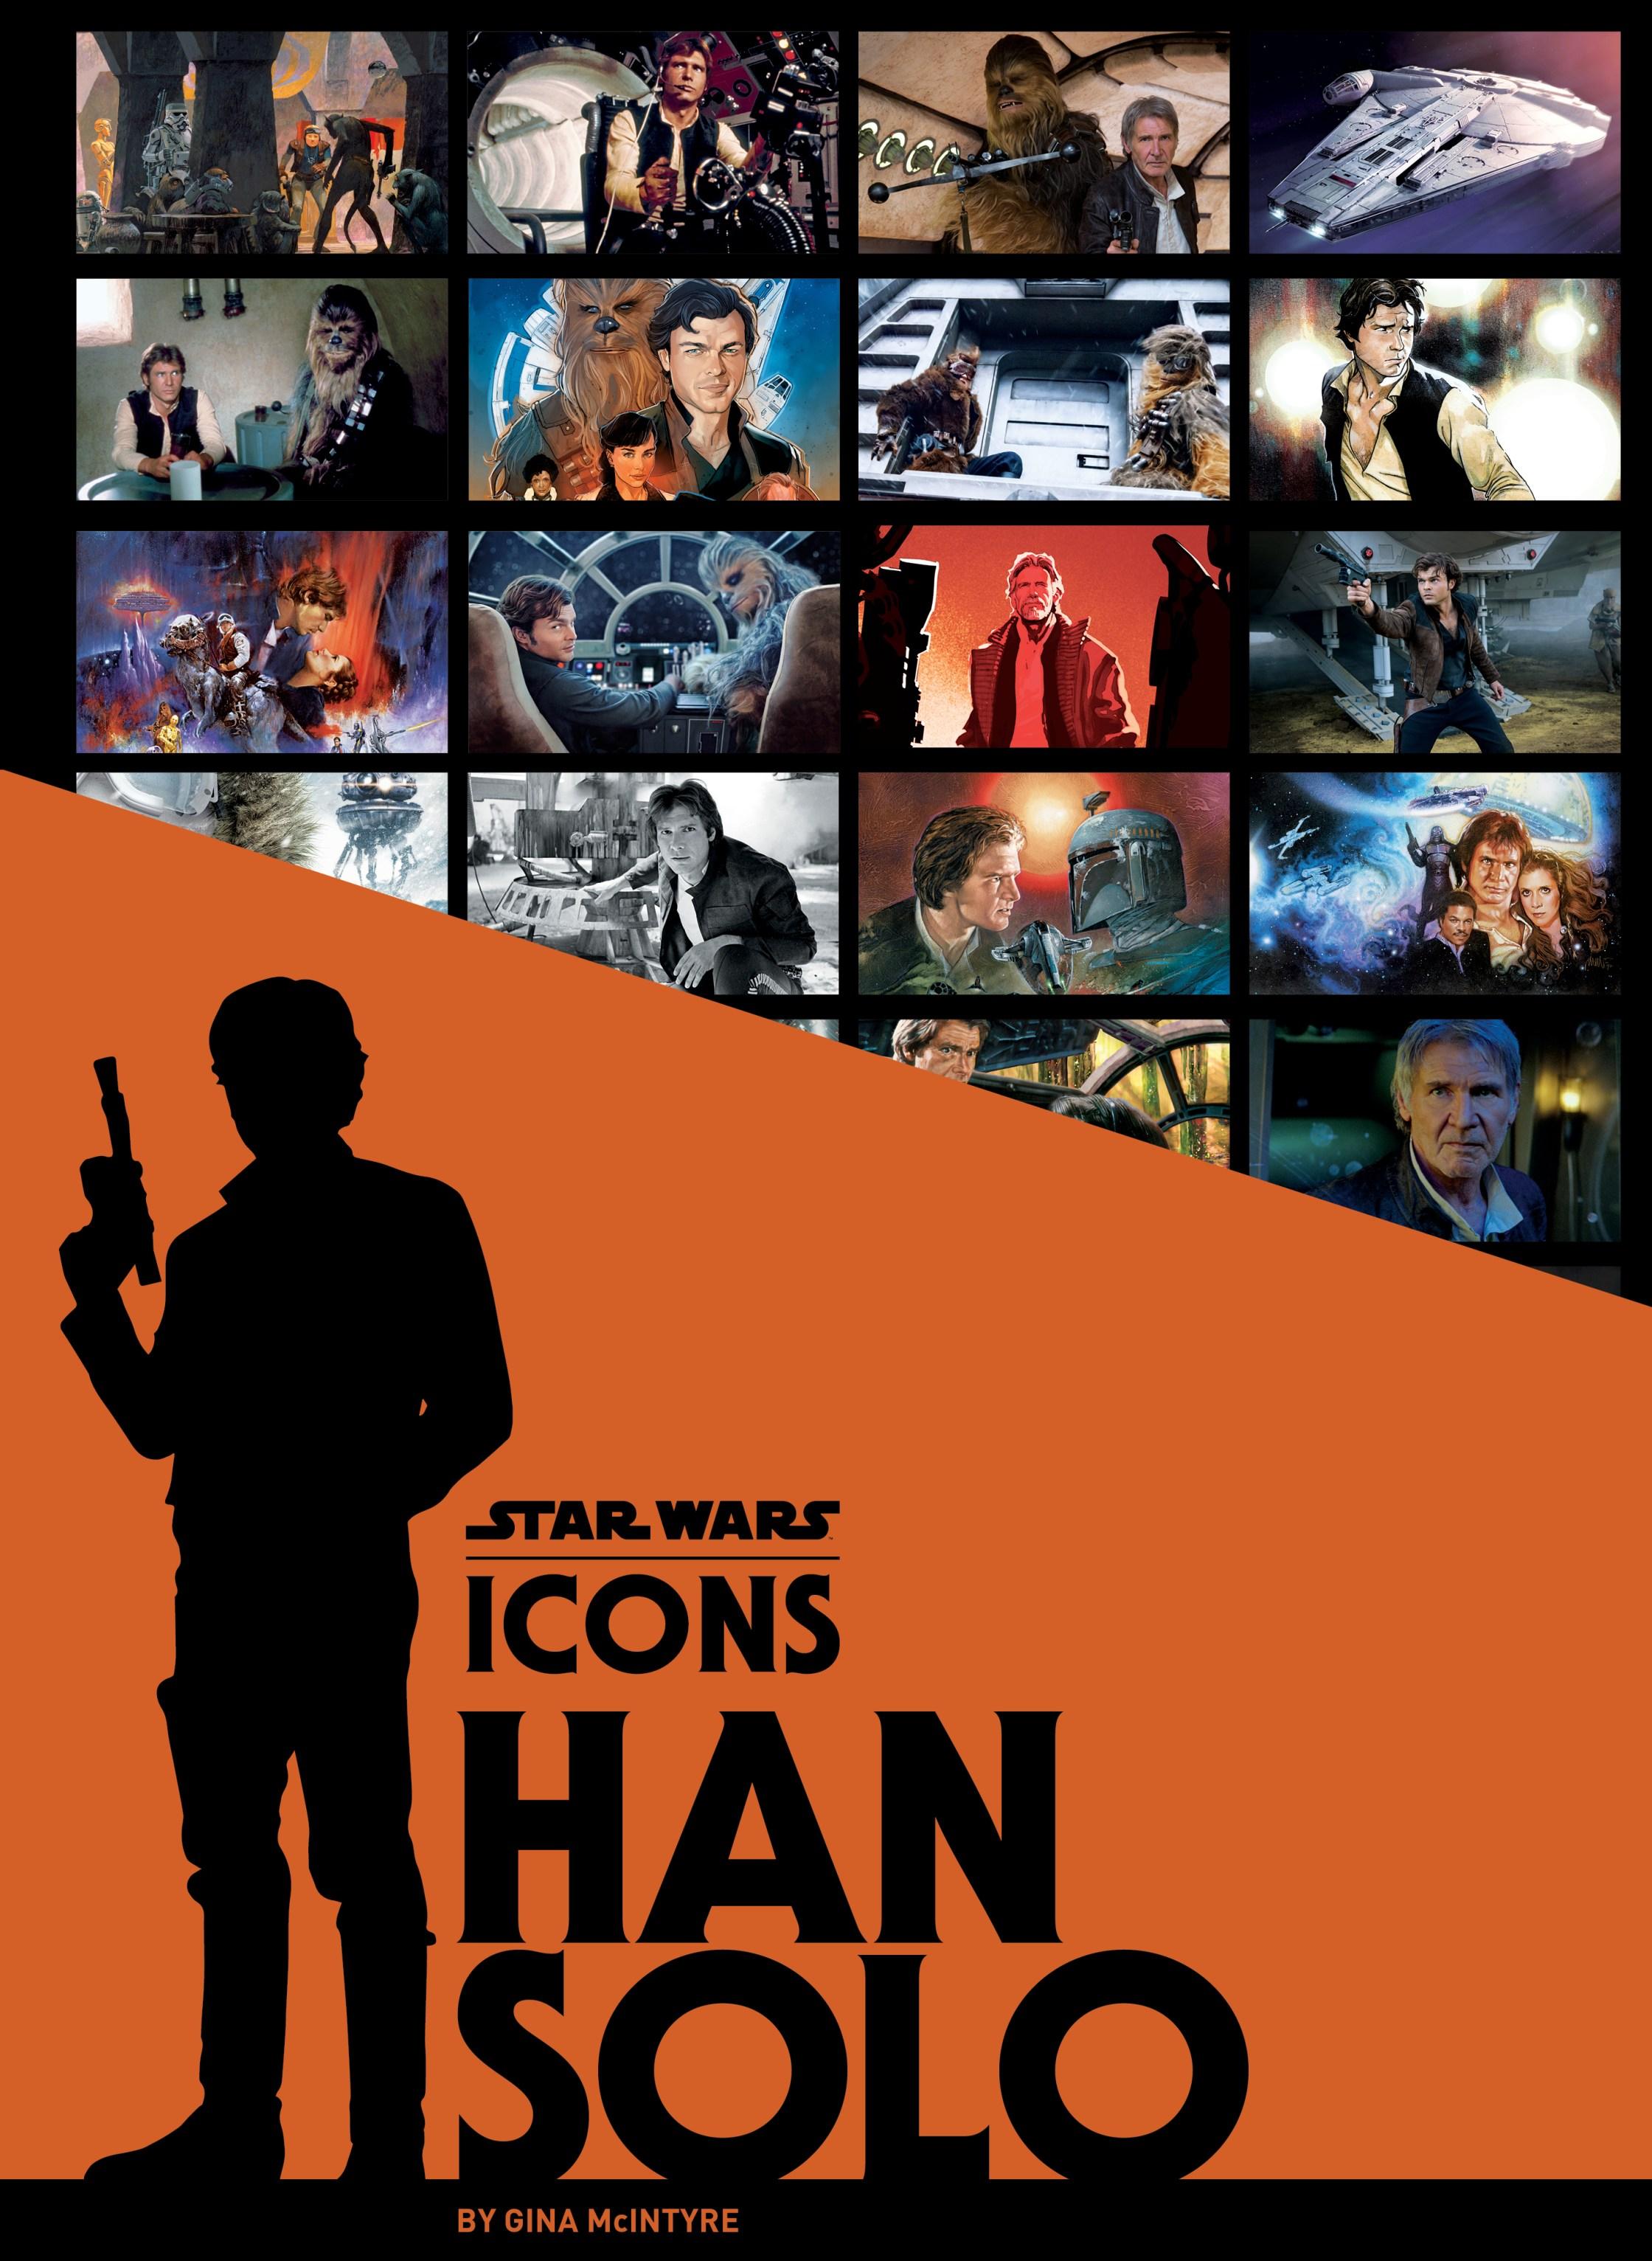 Иконы «Звёздных войн»: Хан Соло